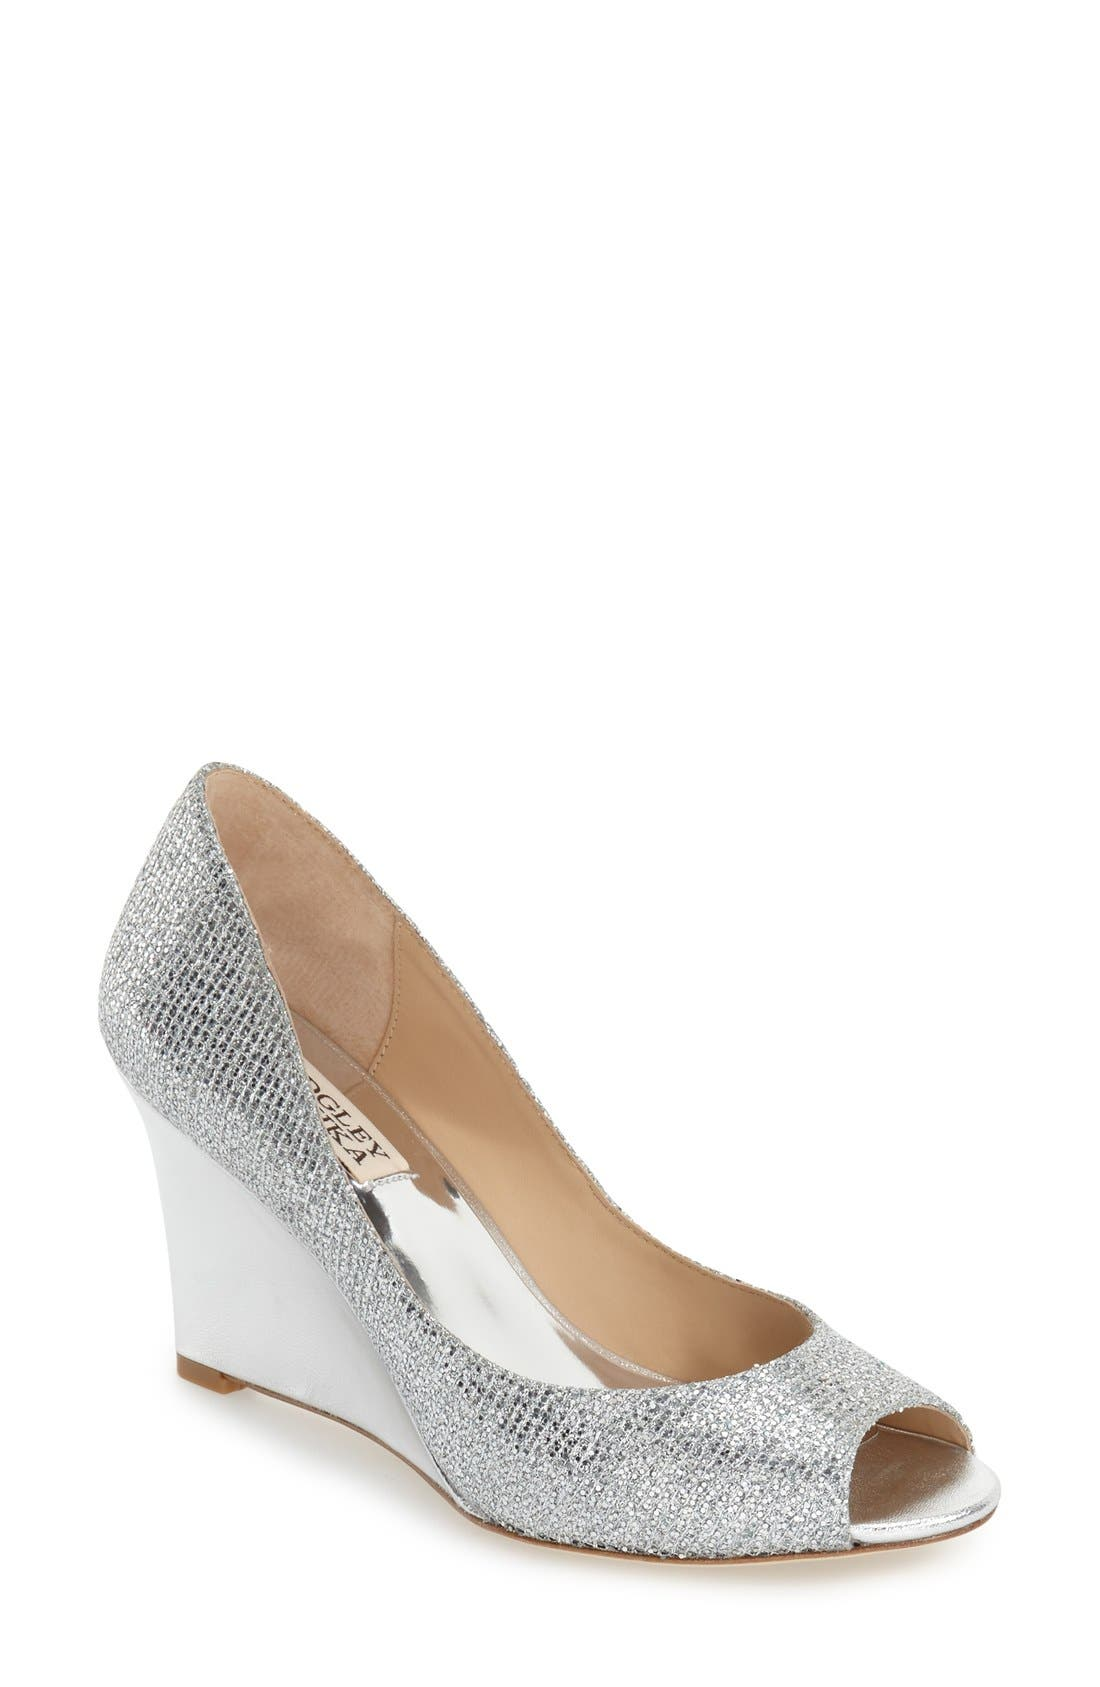 'Awake' Embellished Peep Toe Wedge Pump,                         Main,                         color, Silver Glitter Fabric